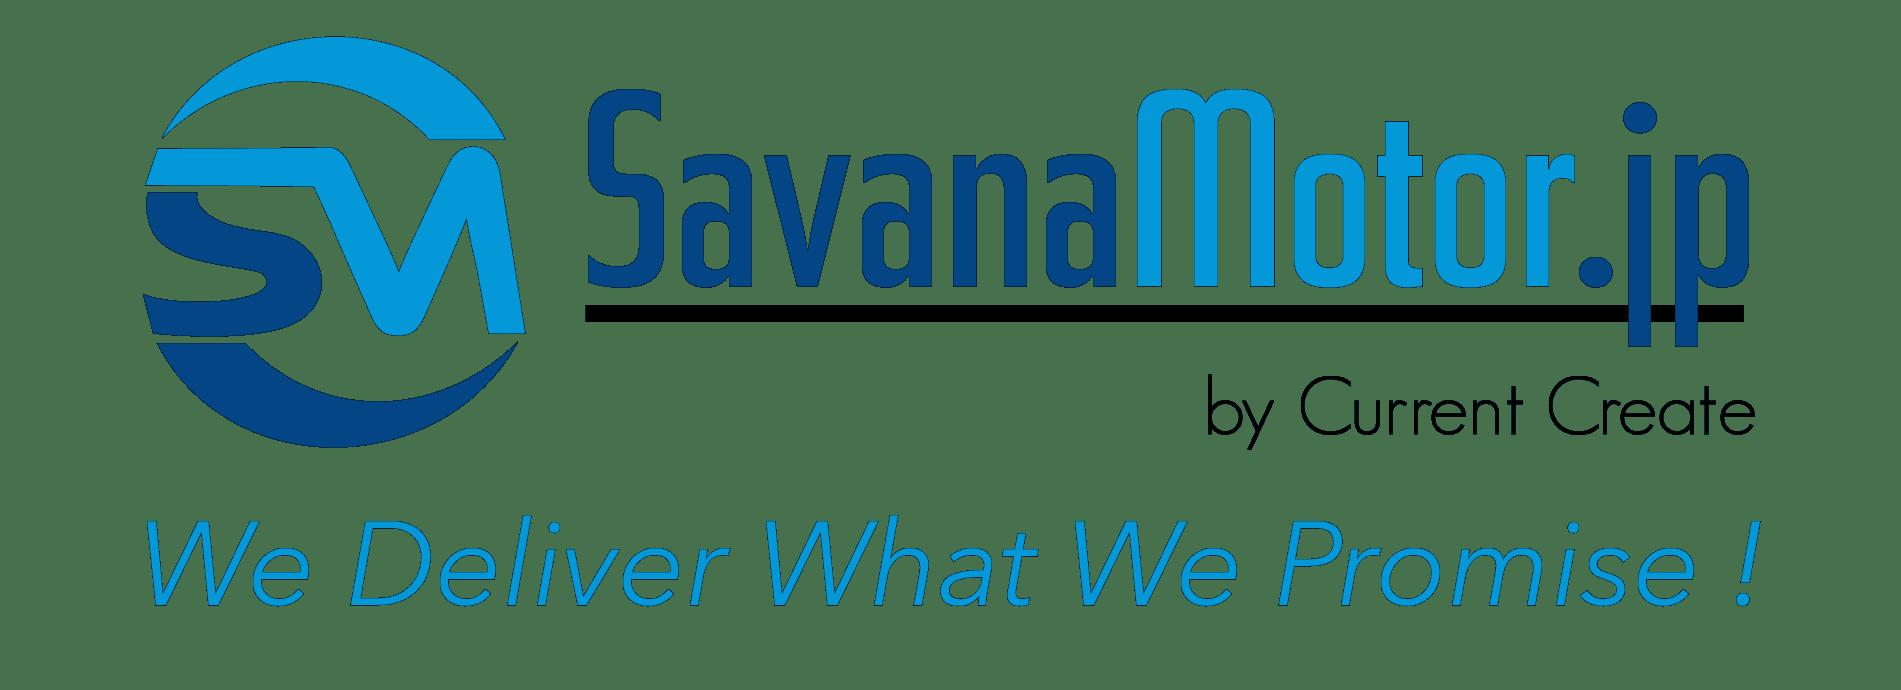 Savana Motor